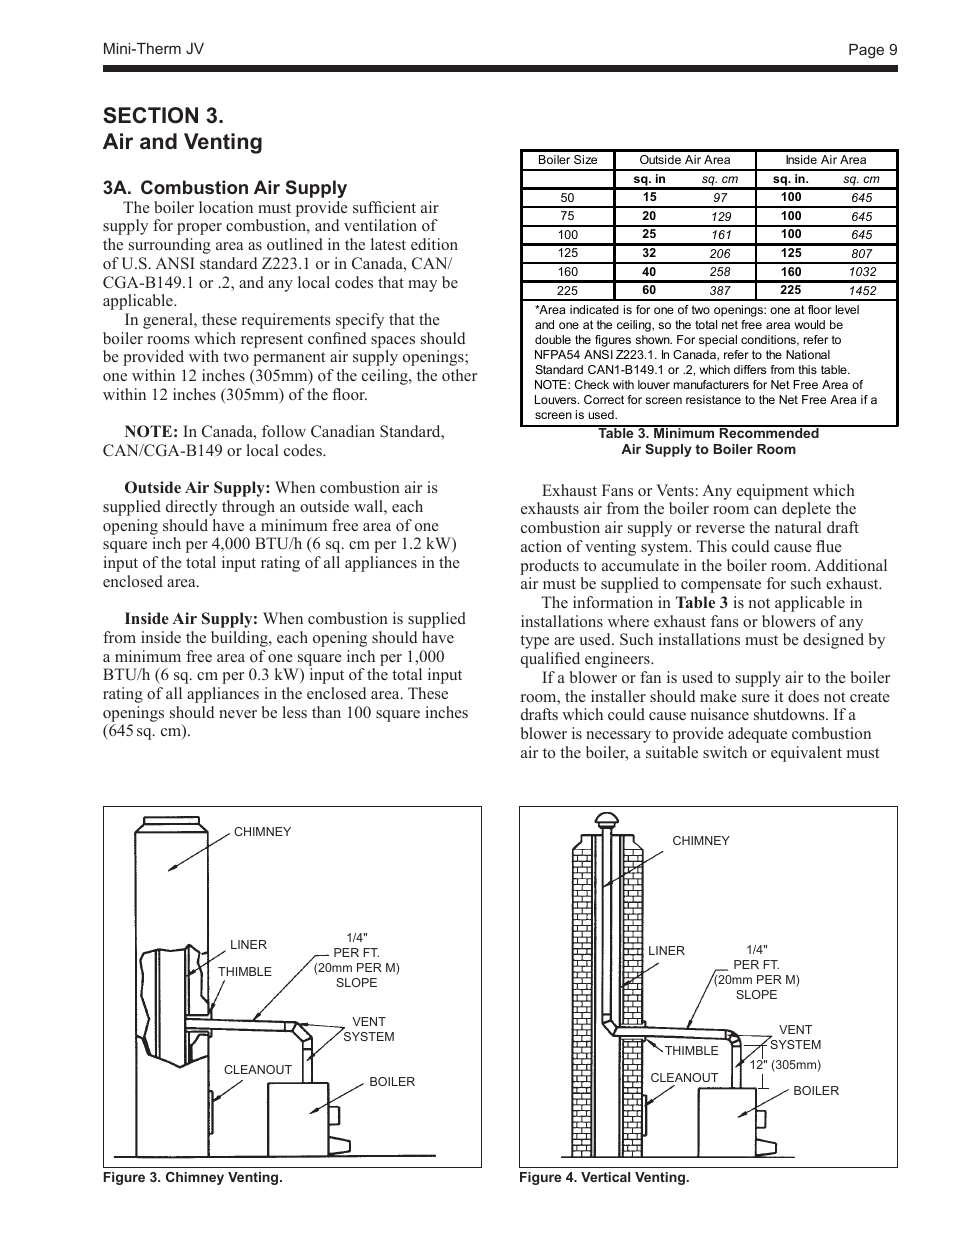 3a combustion air supply laars mini therm jvs sizes 50 225 rh manualsdir com